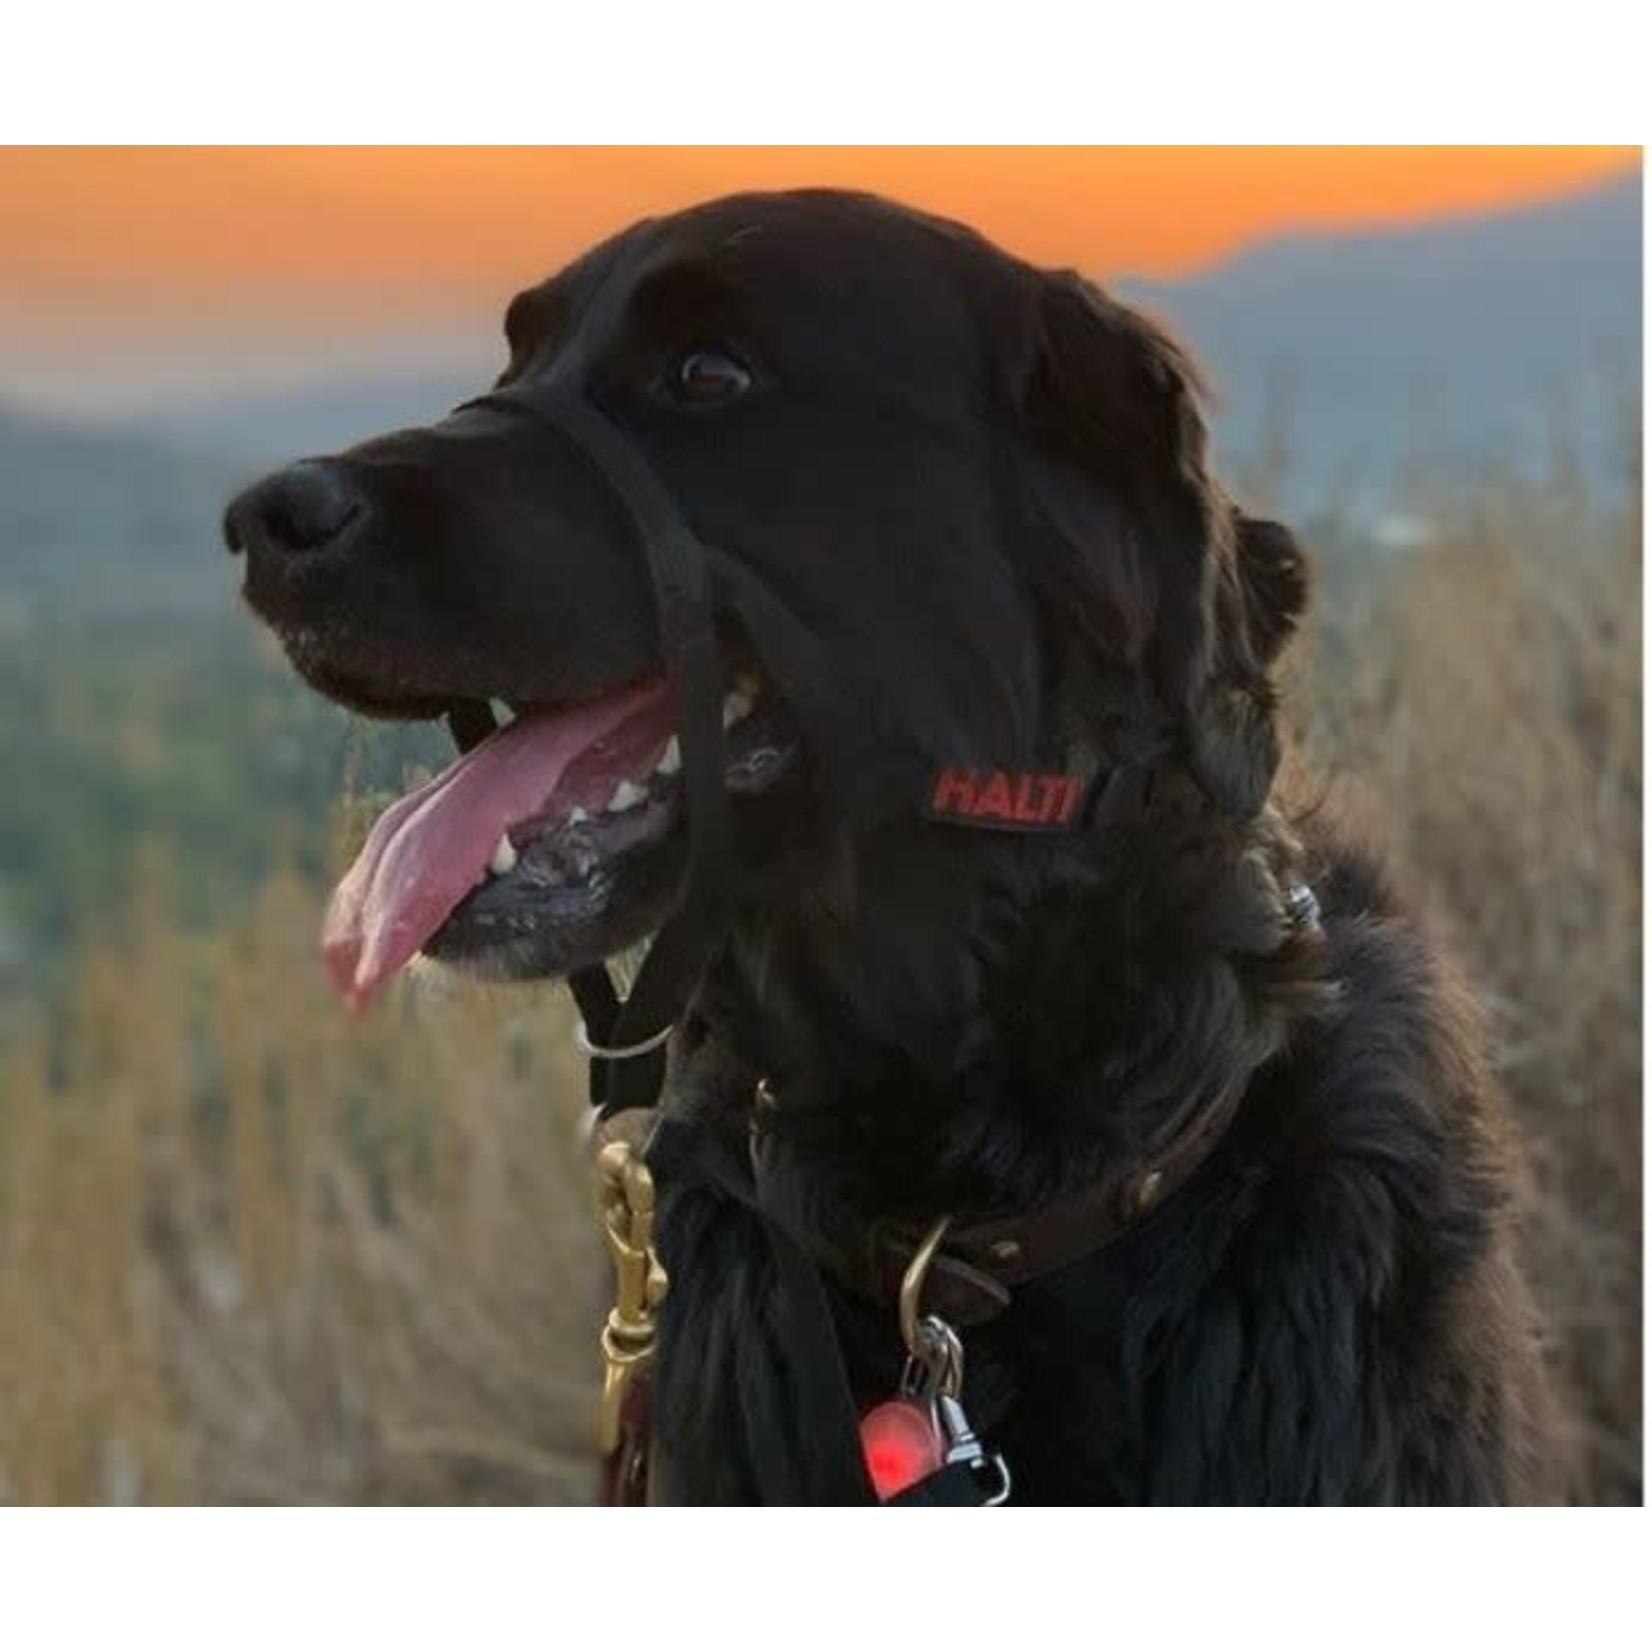 Company of Animals Halti Dog Headcollar, Black